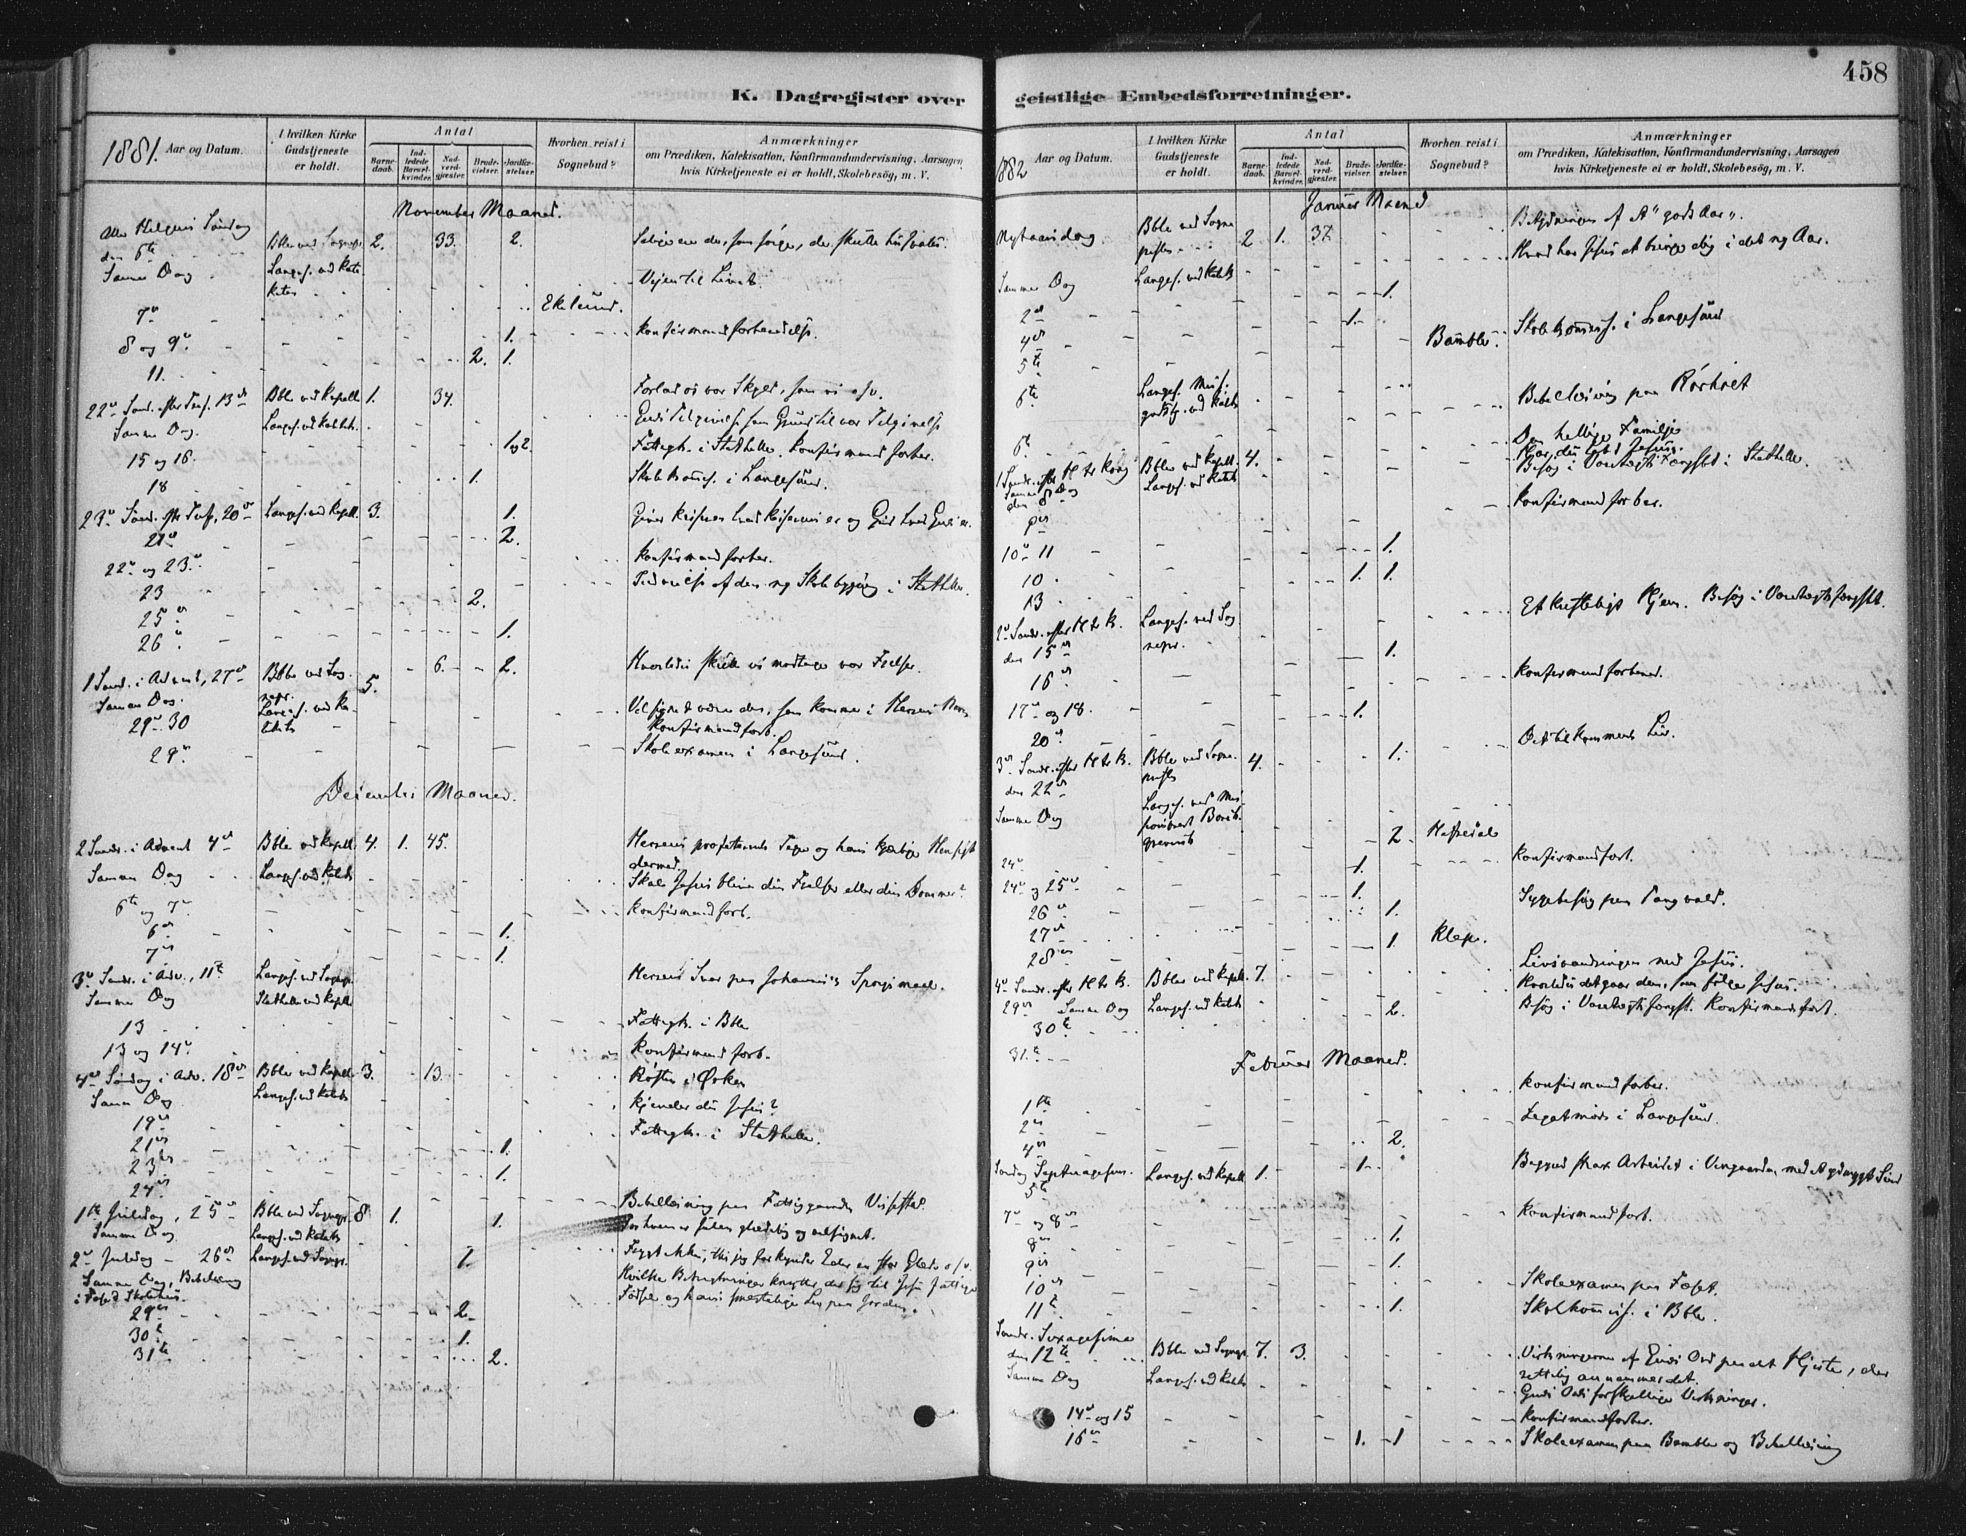 SAKO, Bamble kirkebøker, F/Fa/L0007: Ministerialbok nr. I 7, 1878-1888, s. 458